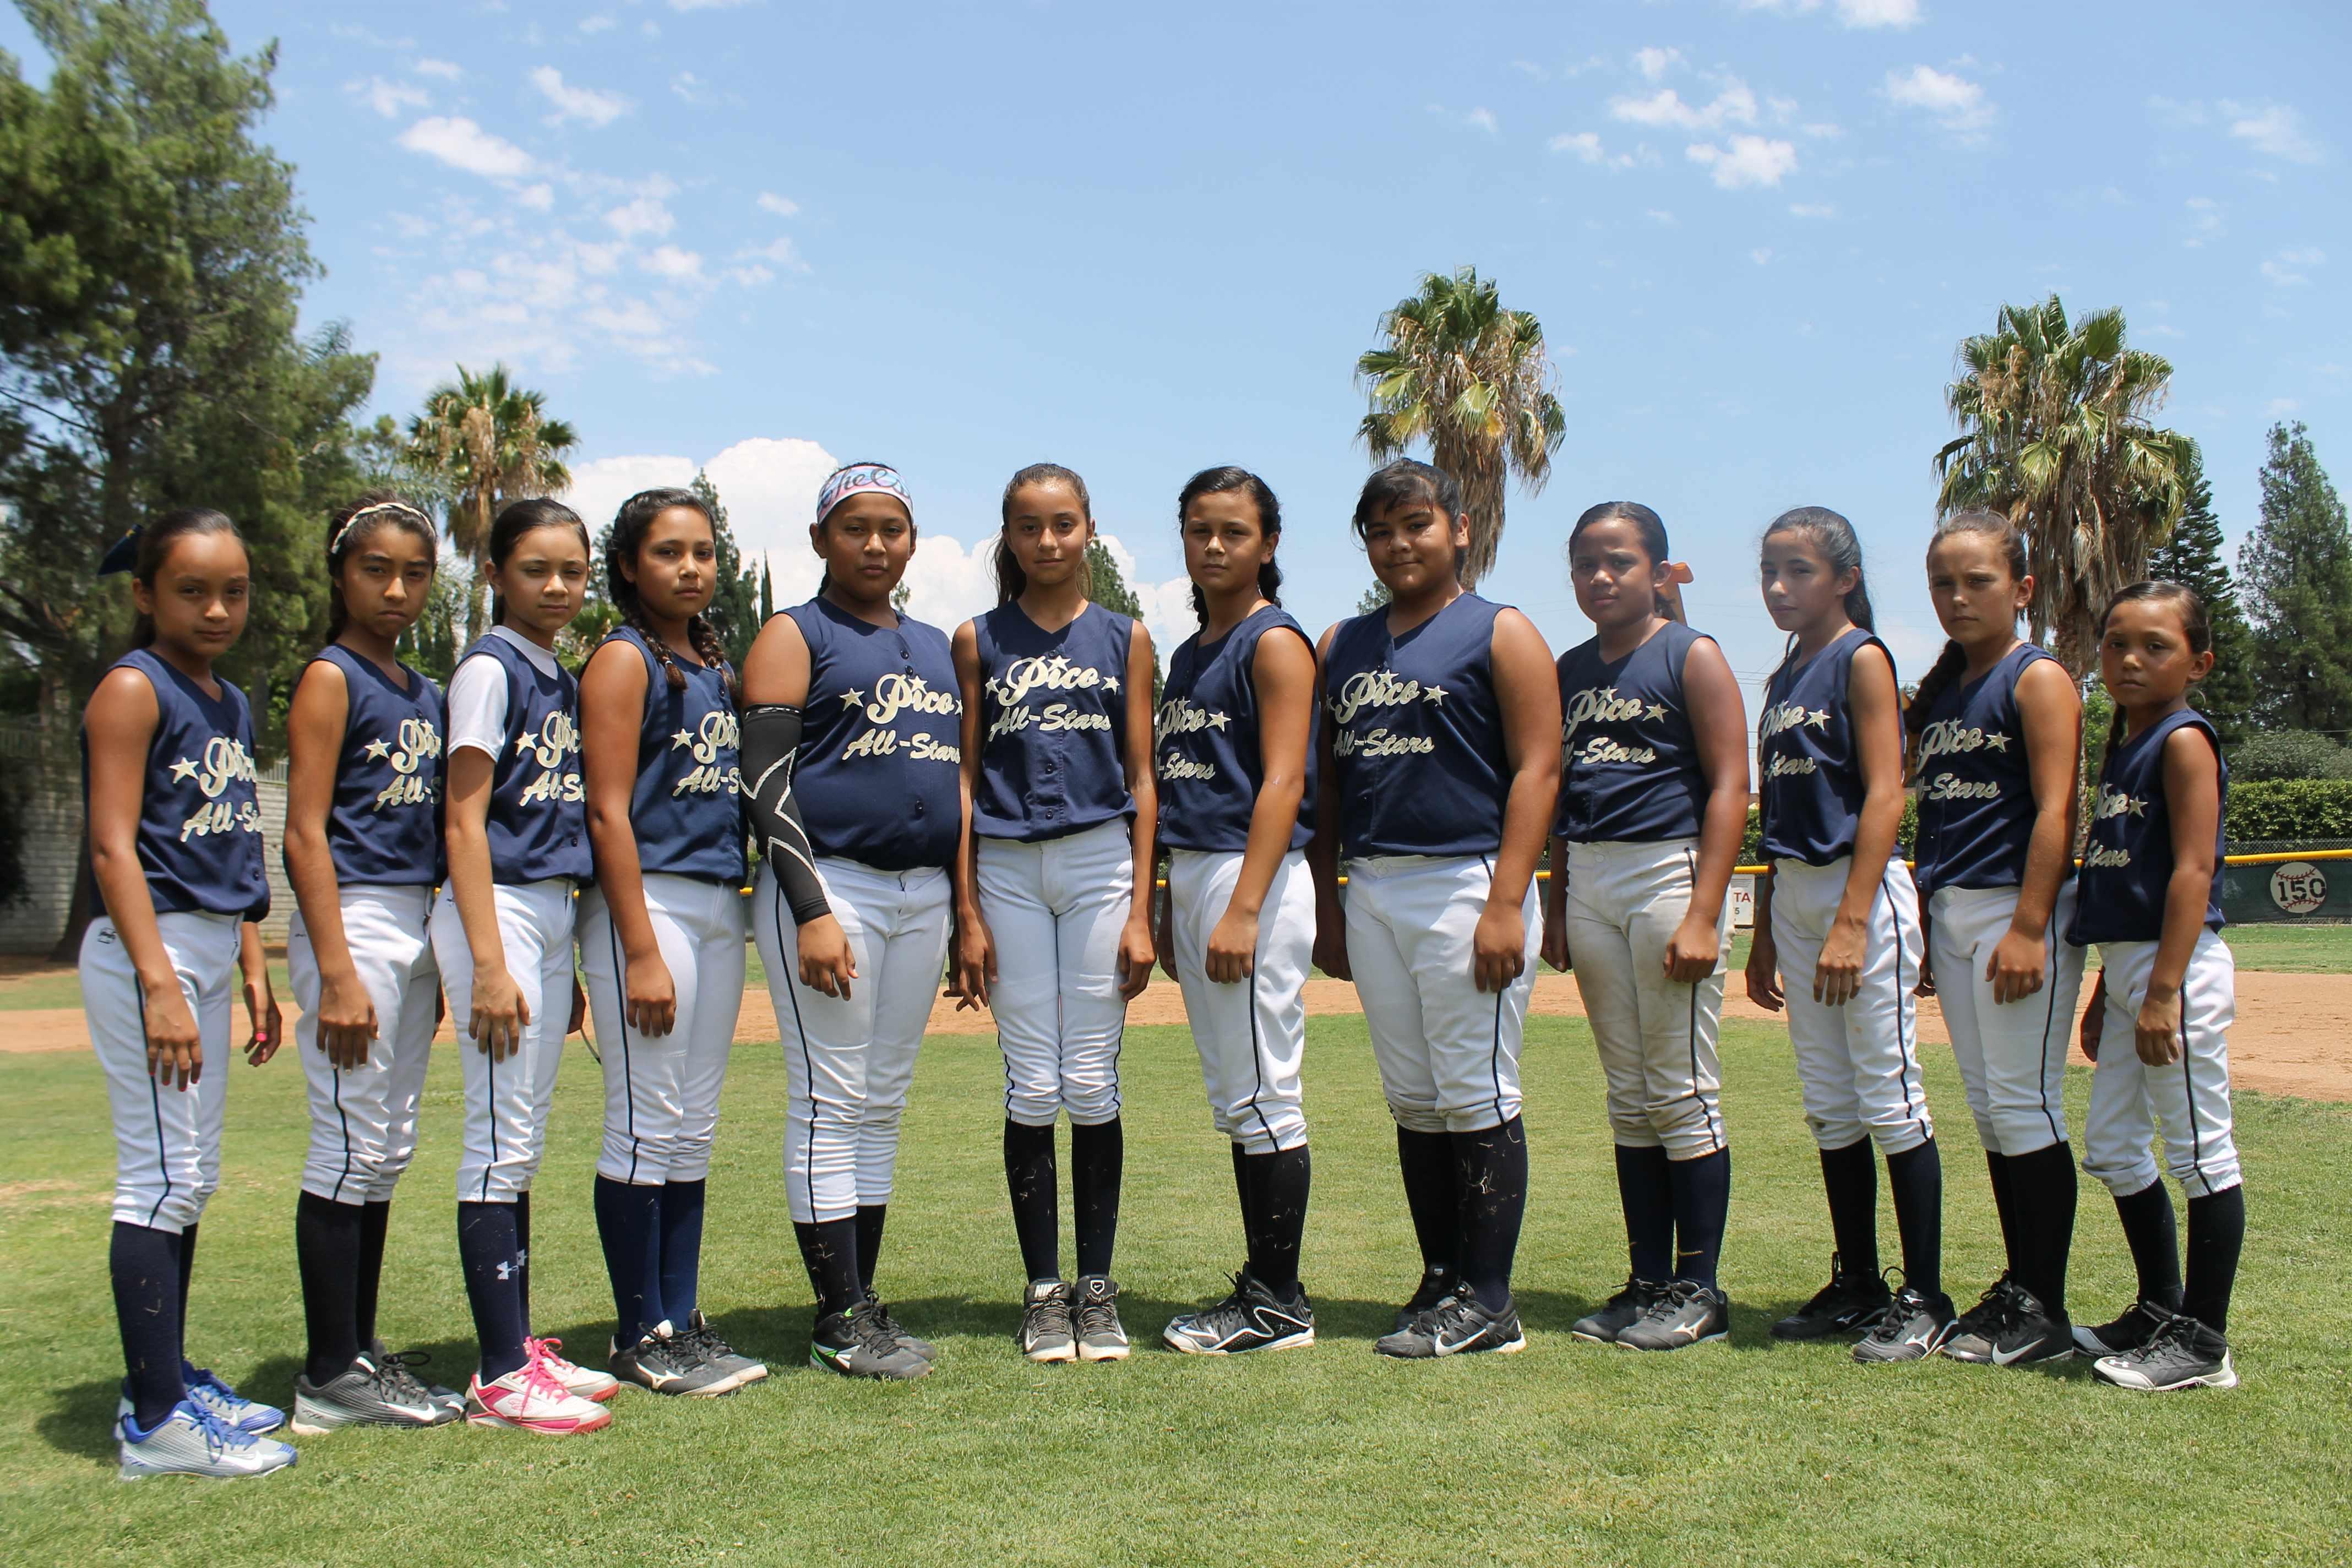 pico rivera girls softball